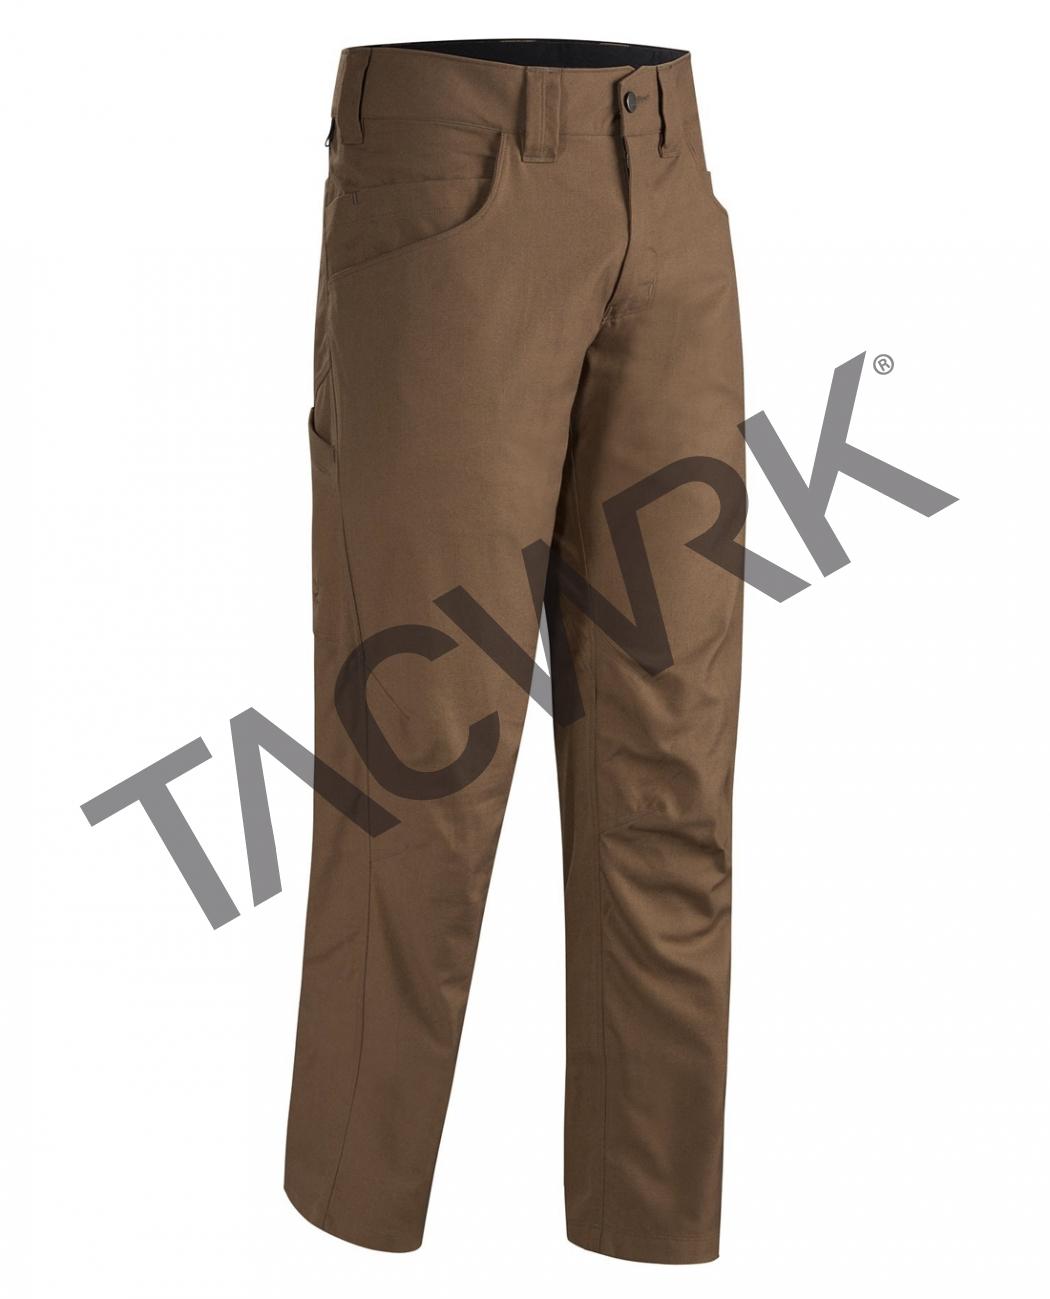 870ca071274a Arc'teryx LEAF xFunctional Pant AR Men's Gen 2 Lahar Brown - TACWRK